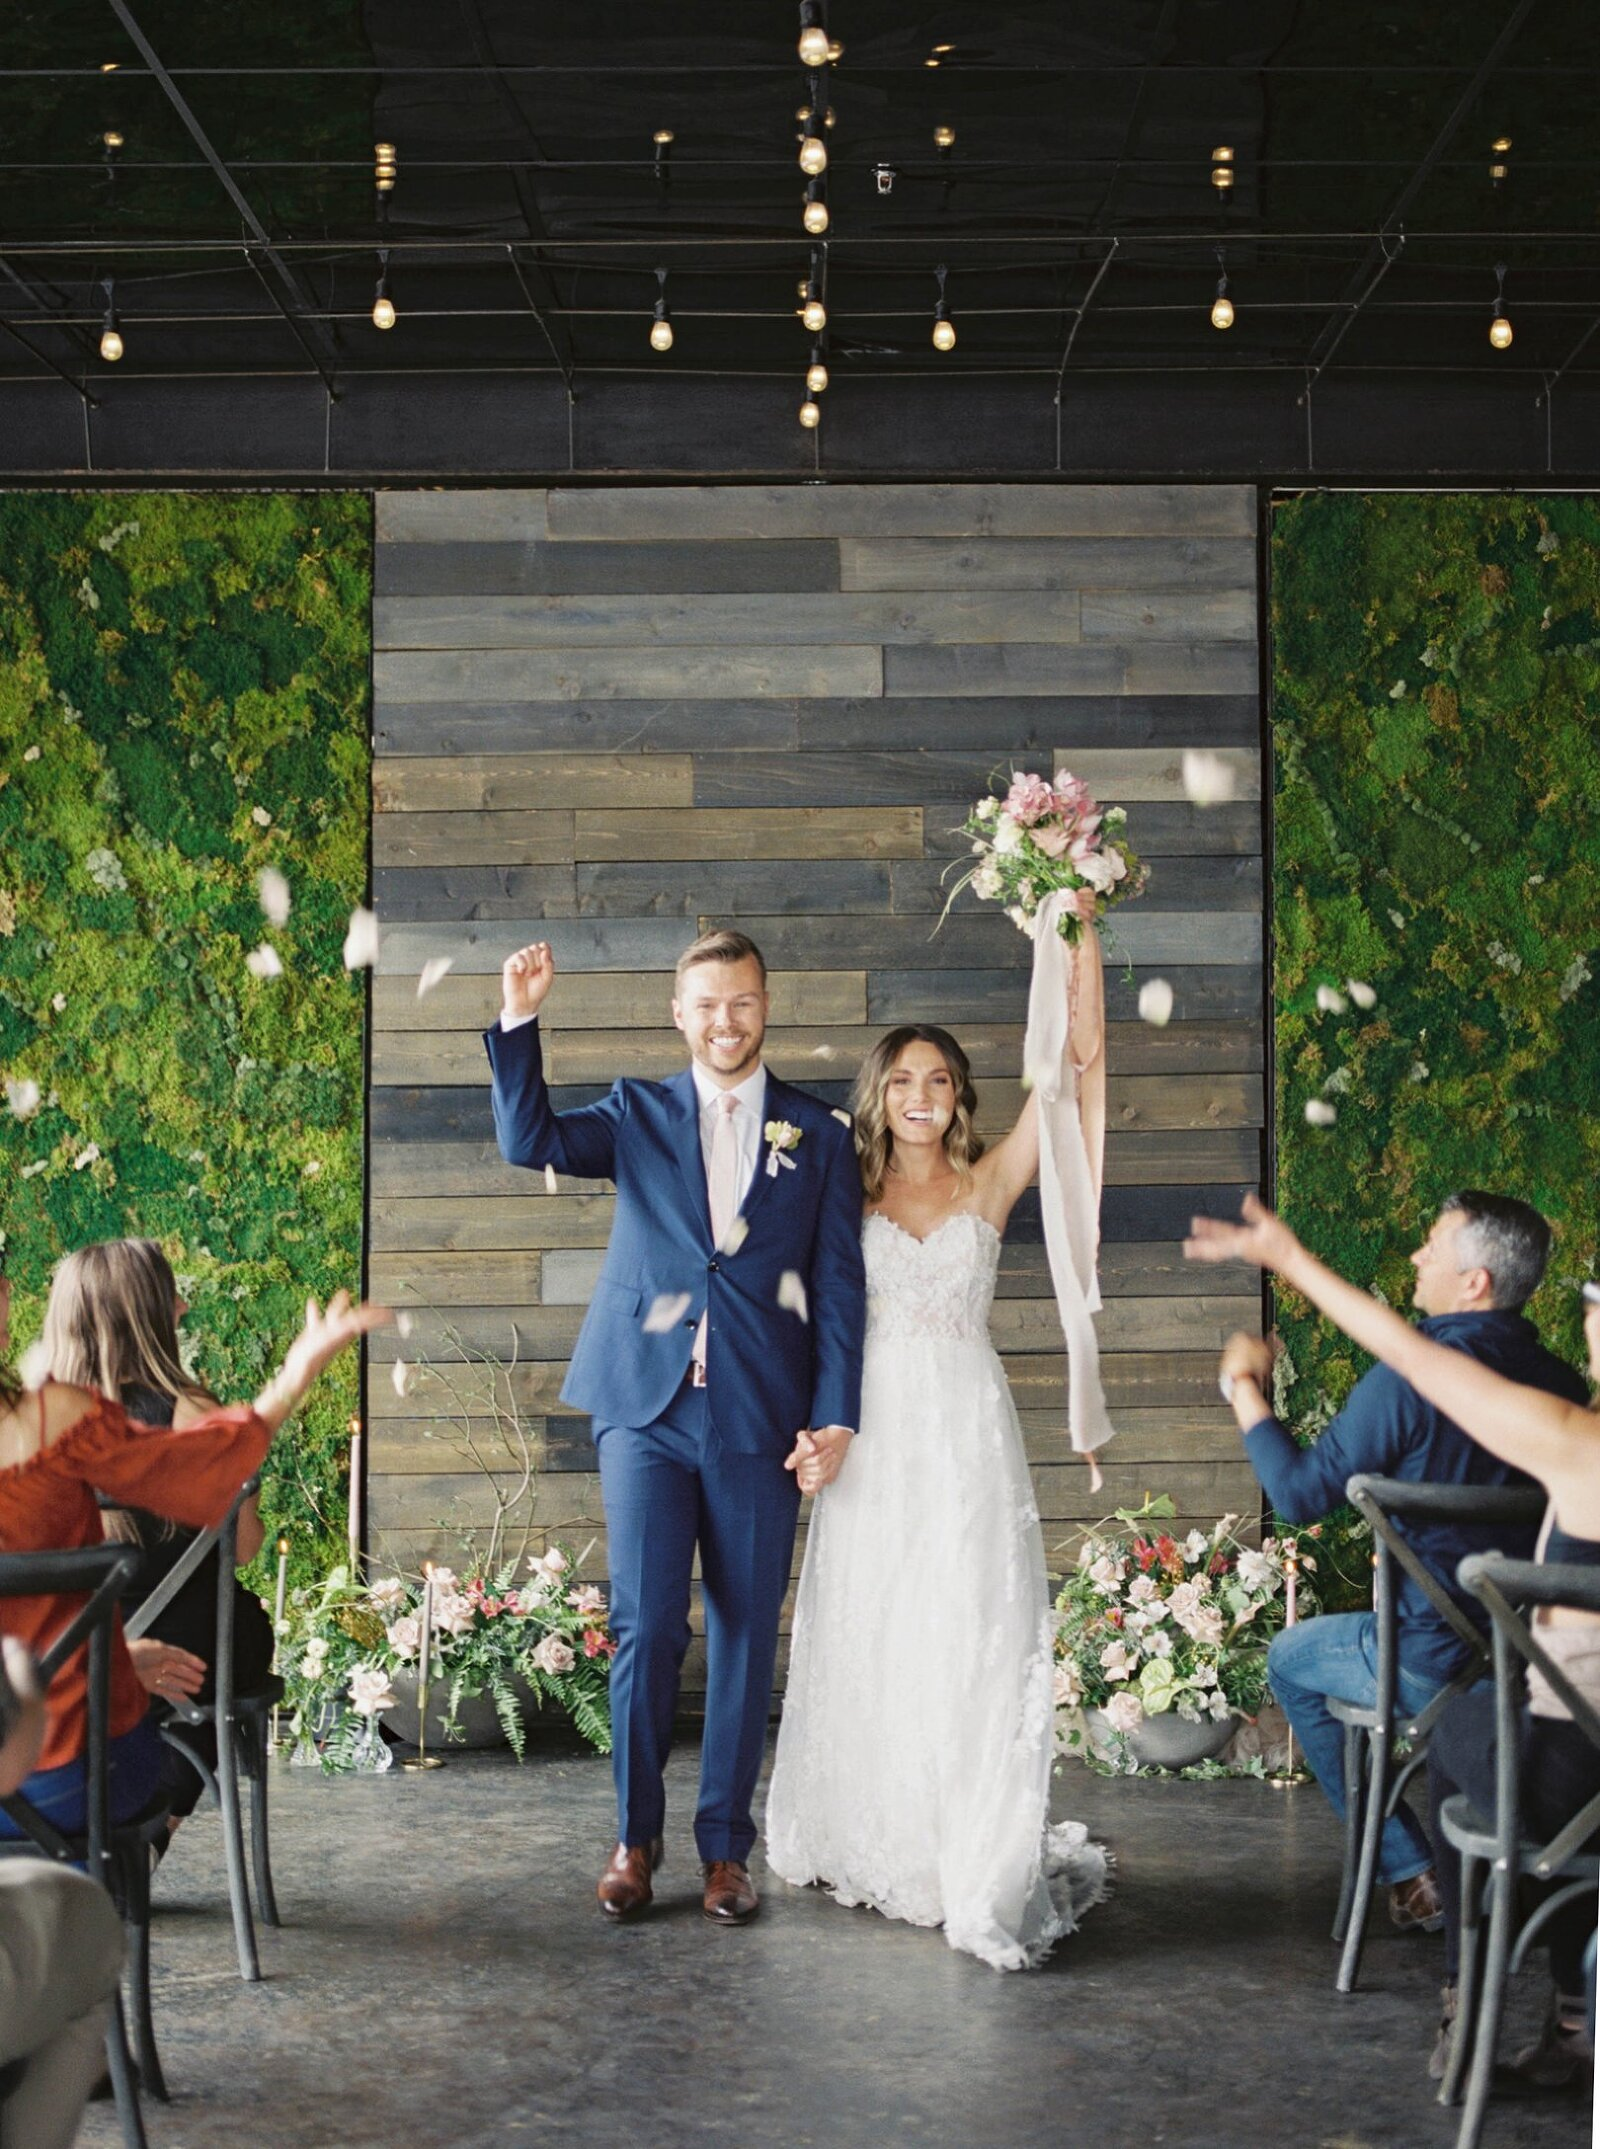 Denver wedding photography, elegant light and airy wedding ceremony Amanda Berube